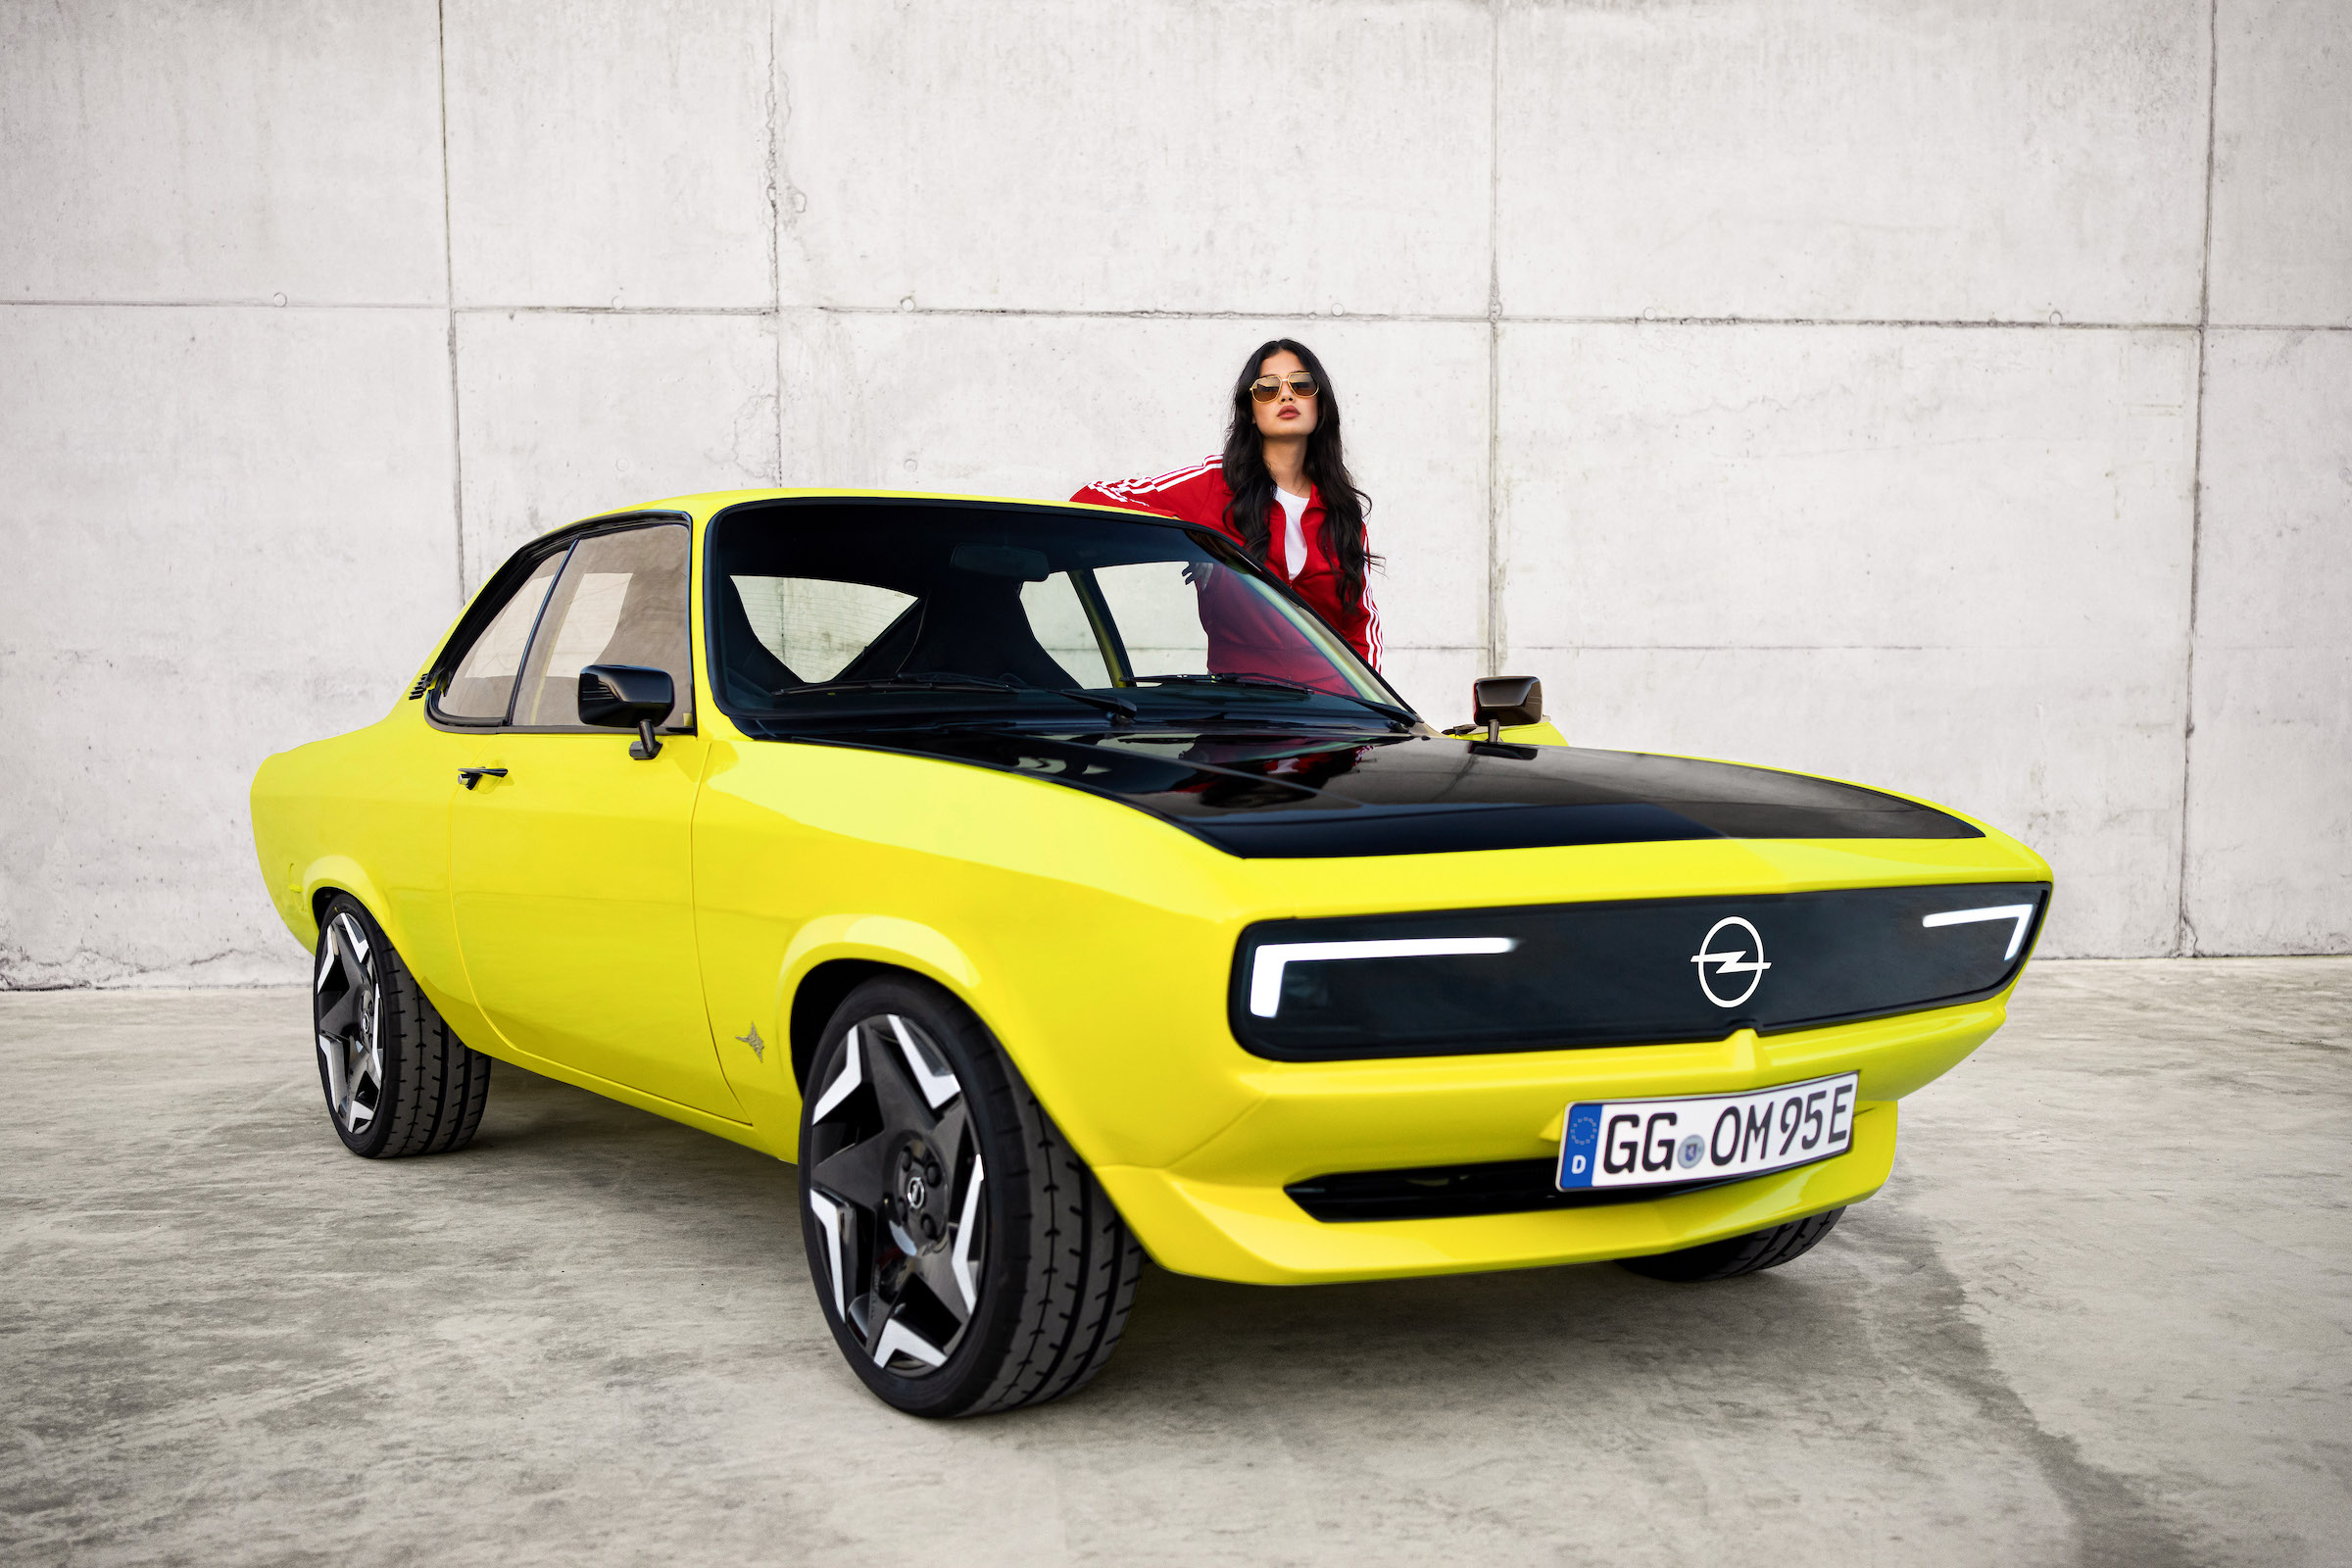 New Opel Manta ElektroMOD fuses 70s cool with 2020s tech